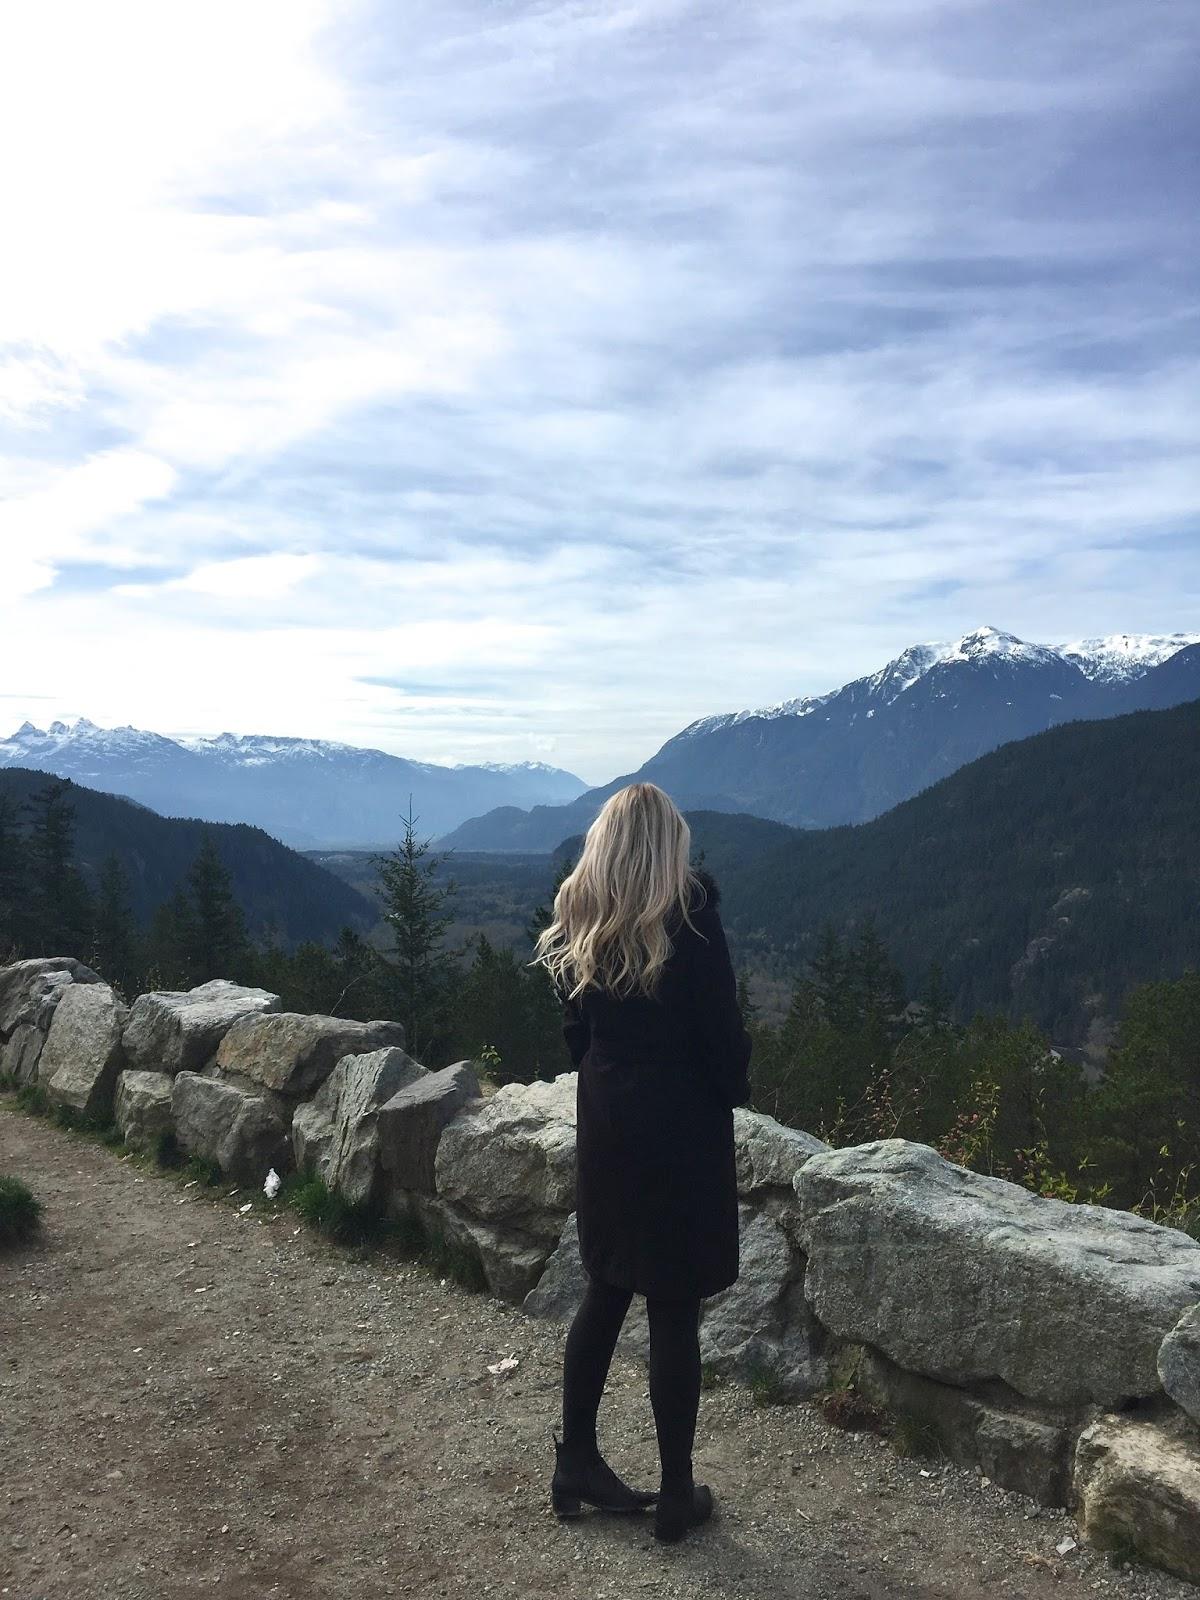 scenery in canada